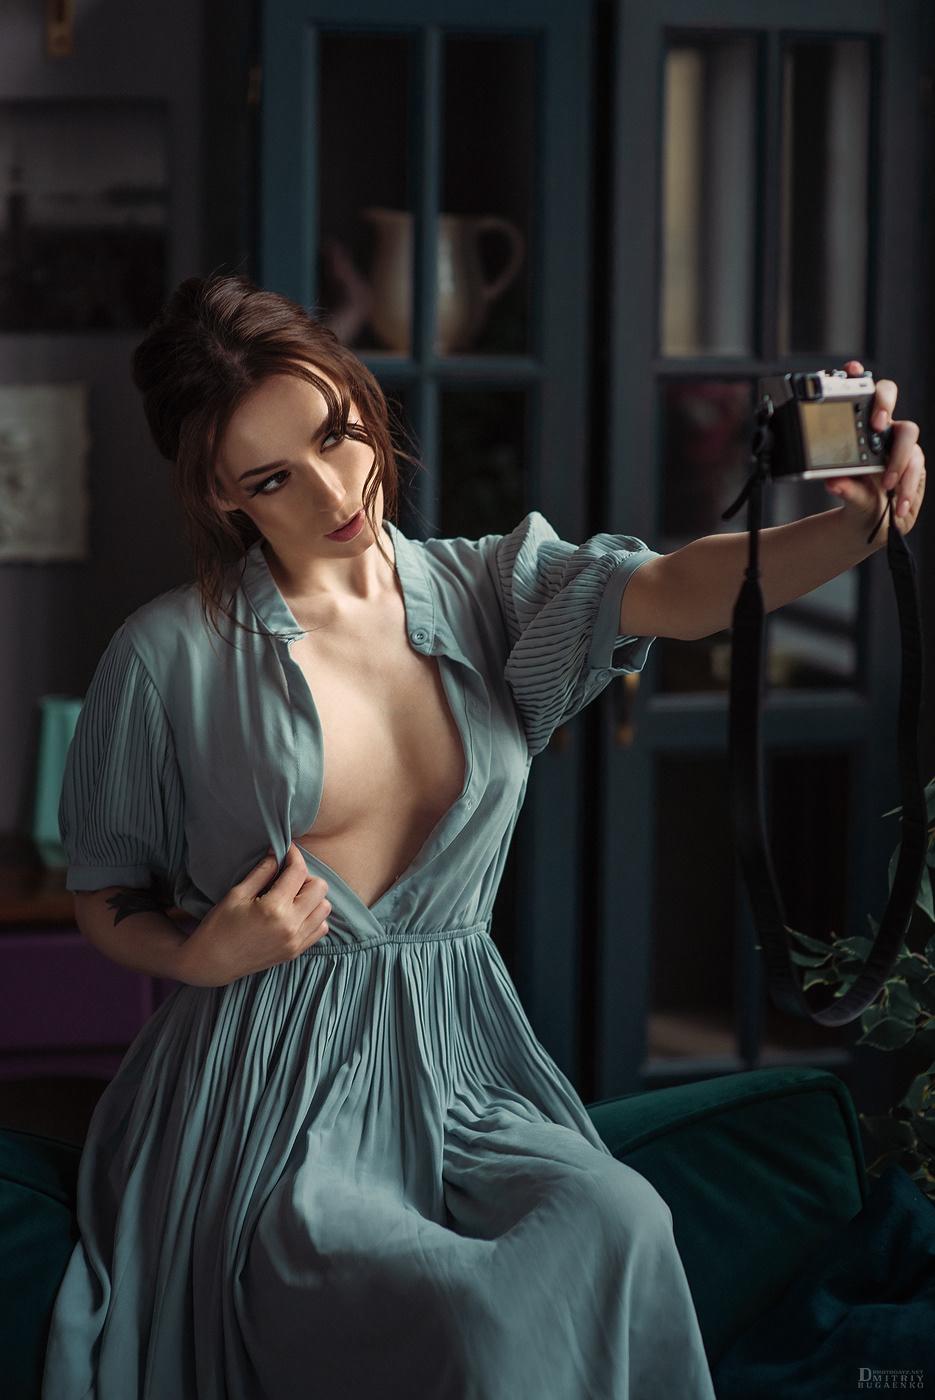 Selfie / модель Yana Arbenina фотограф Dmitriy Bugaenko